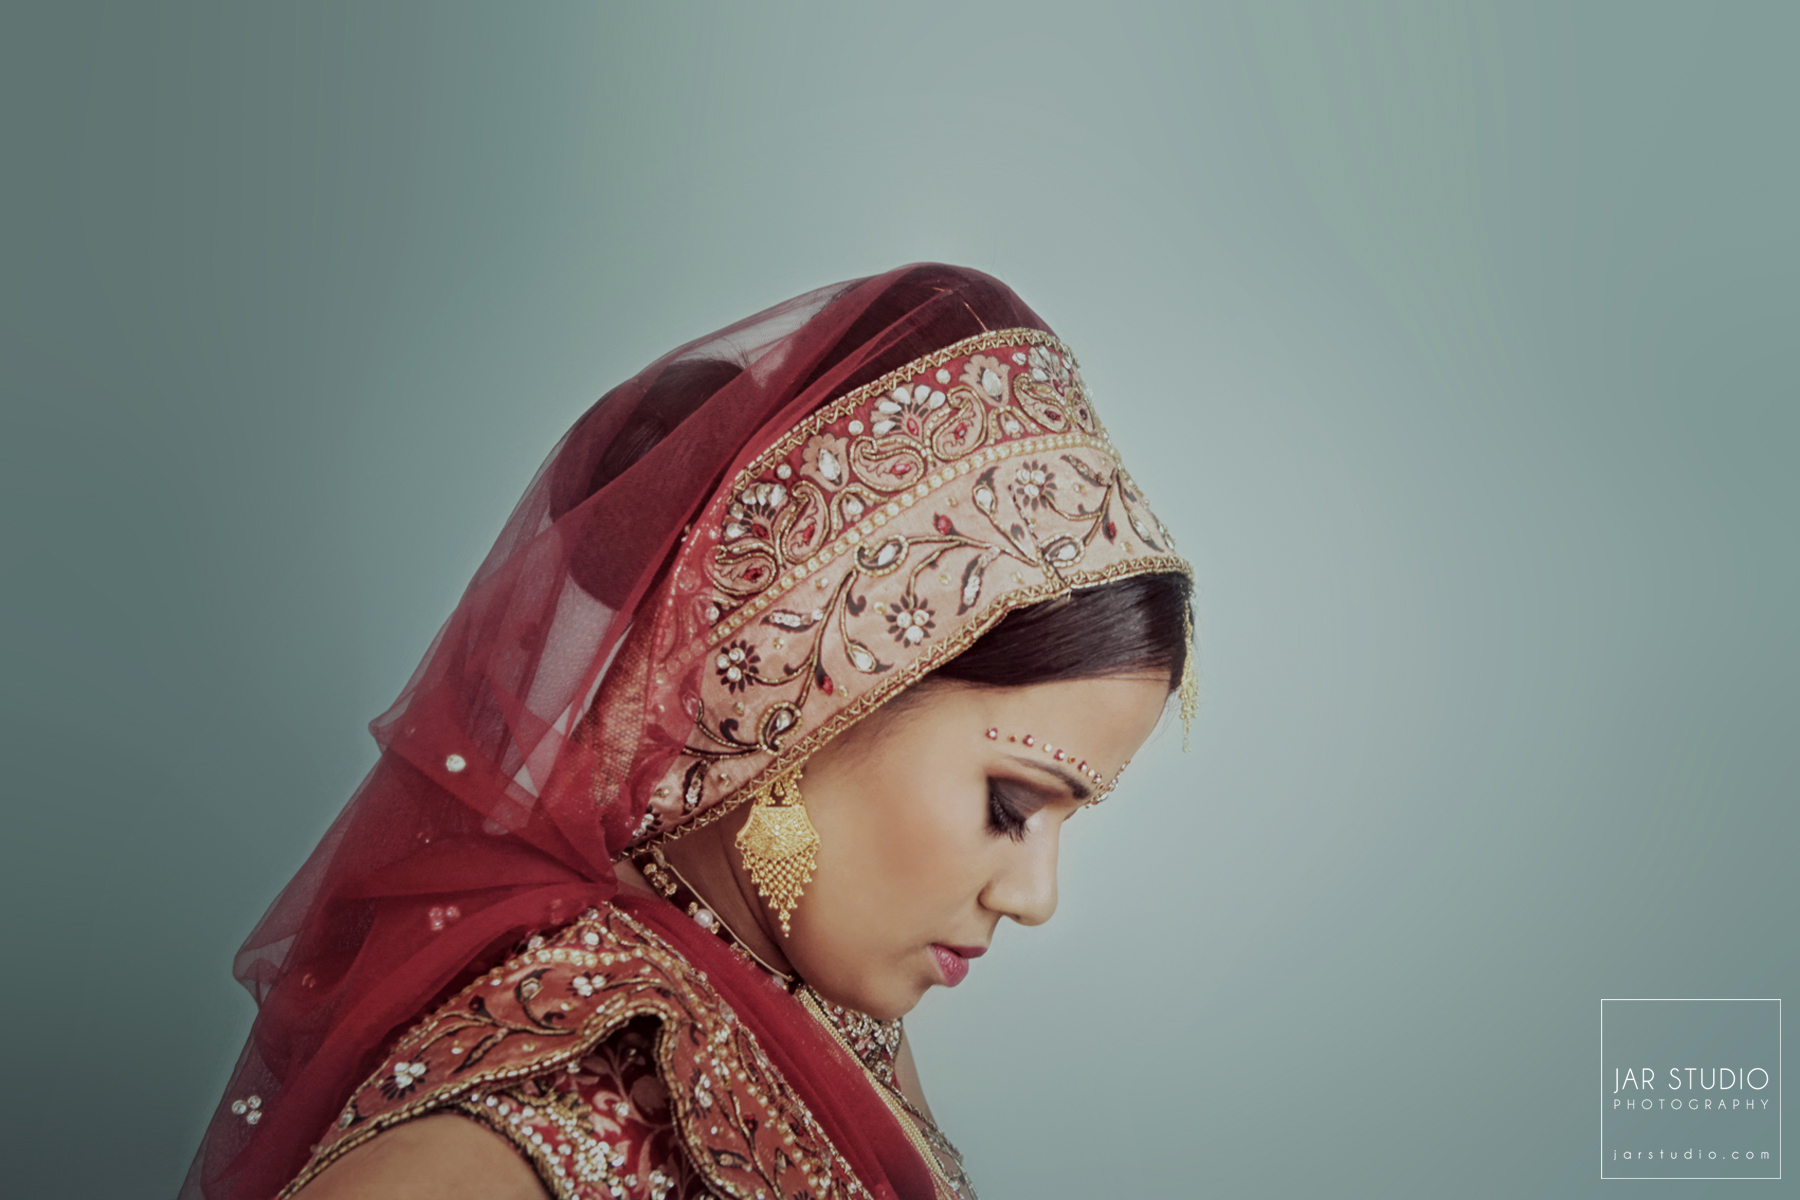 18-bride-saree-jarstudio-indian-weddings-photography-tampa-fl.JPG